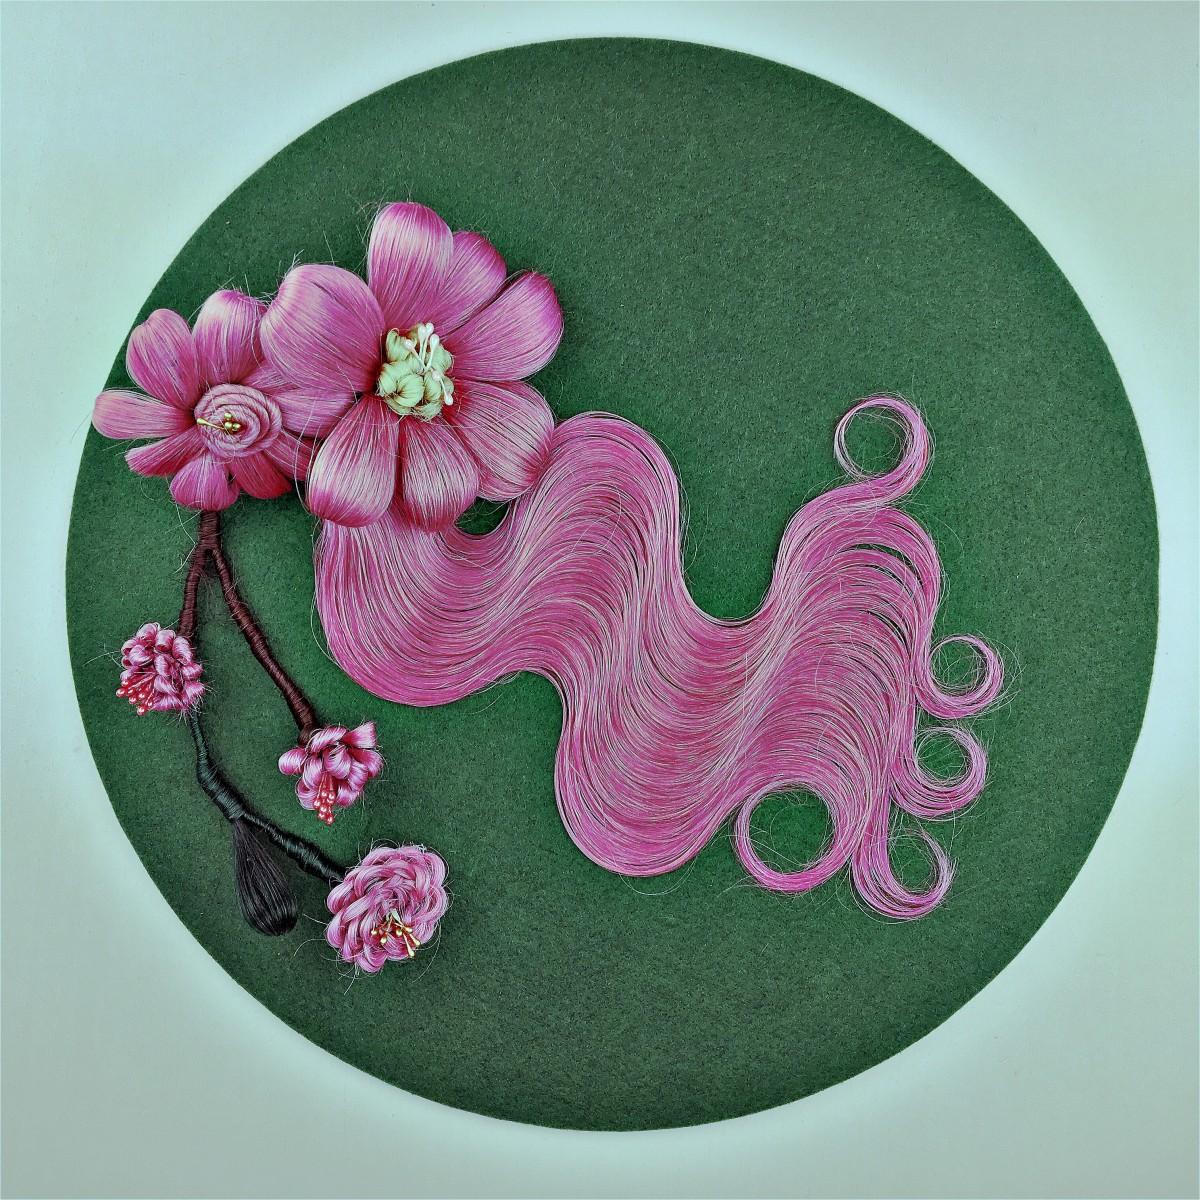 PinkHairflowers